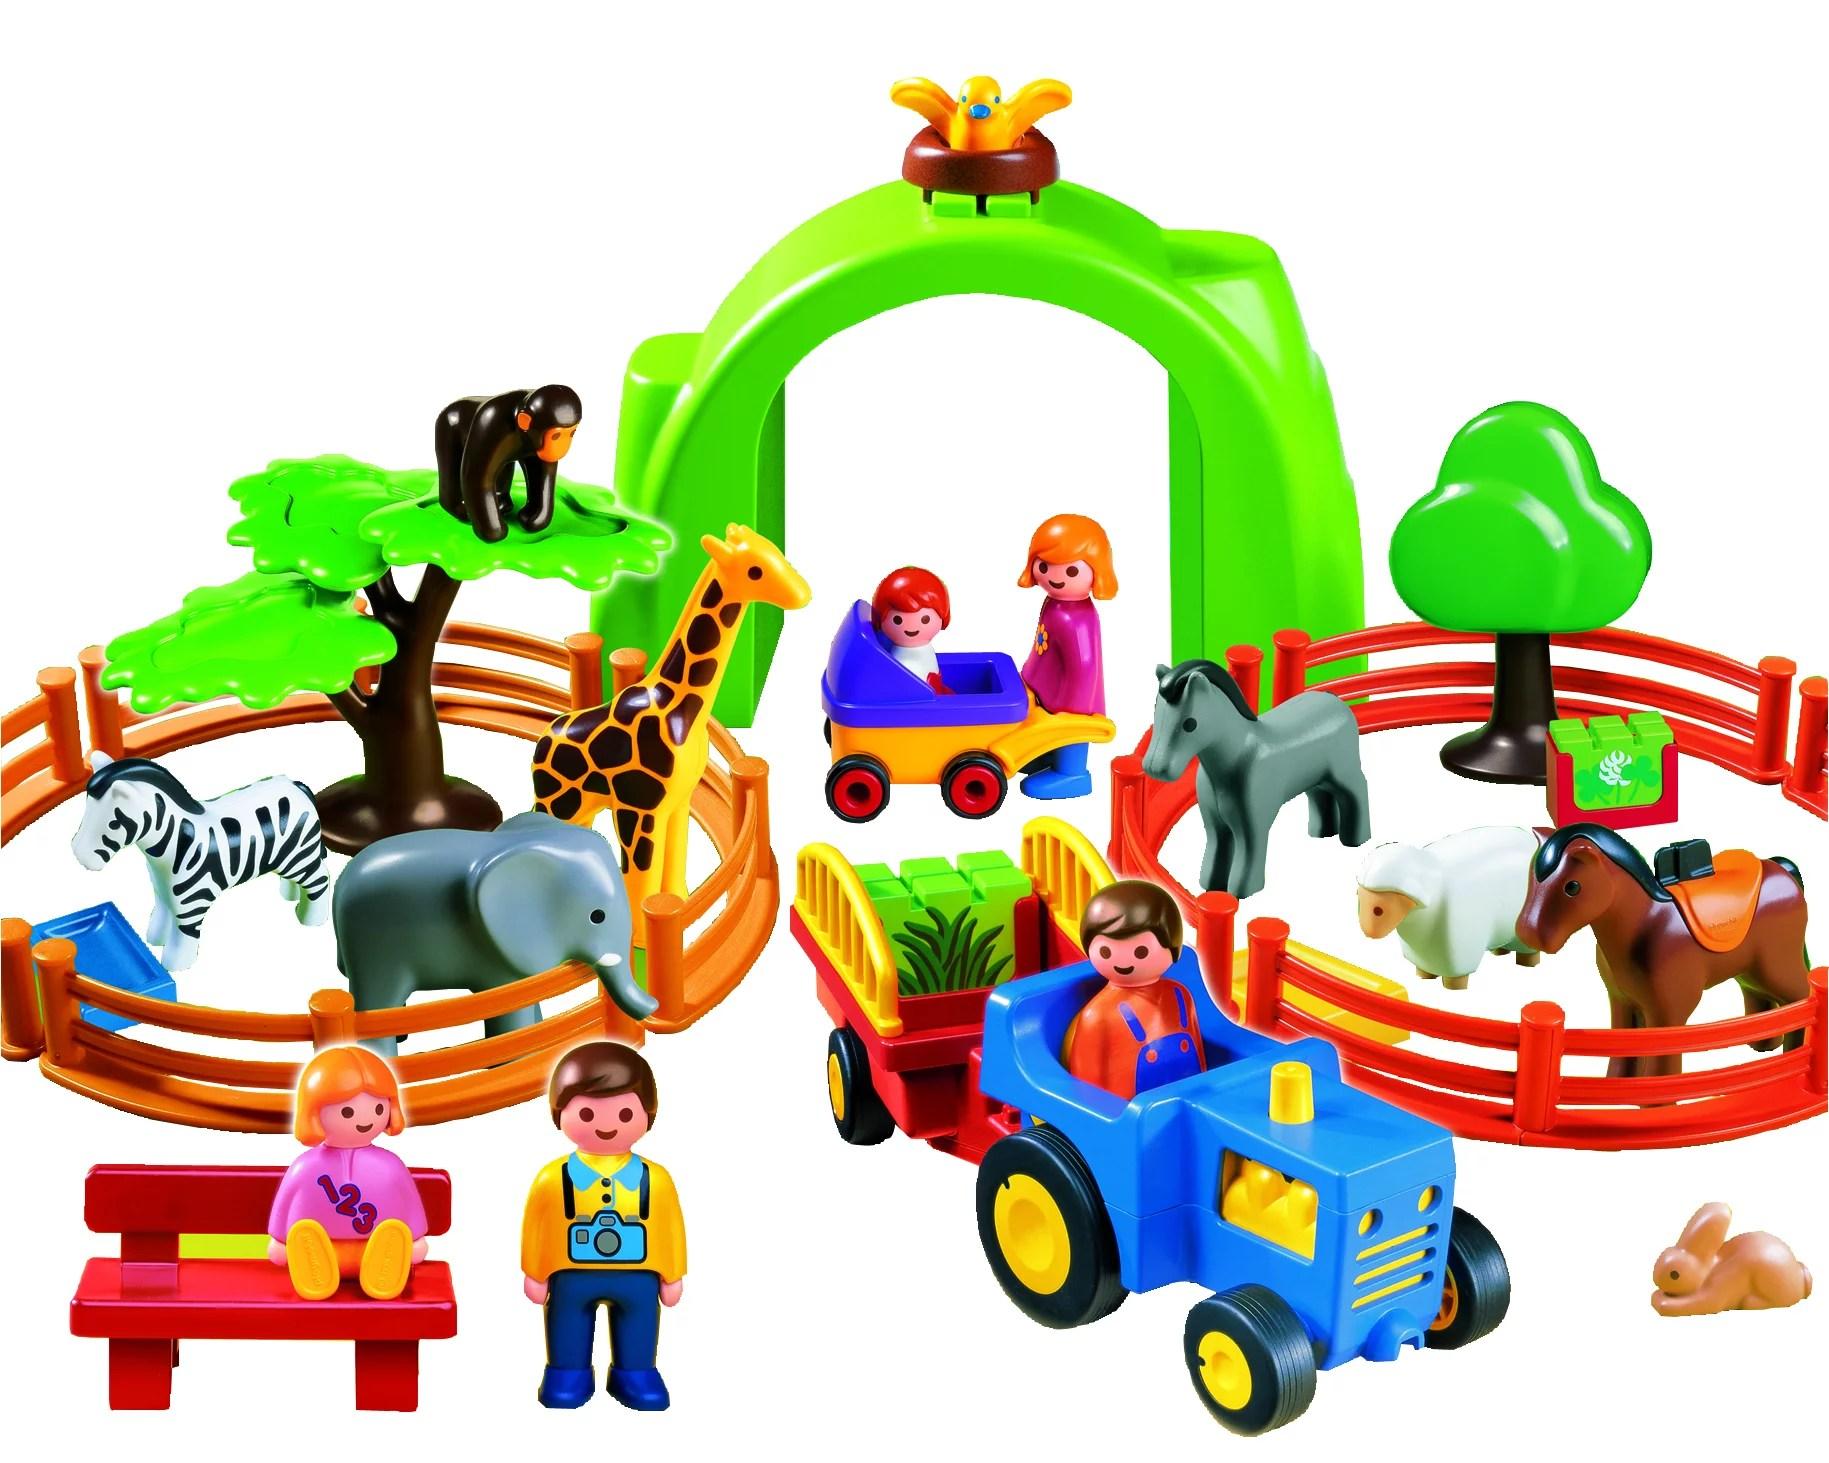 Playmobil 1 2 3 Large Zoo